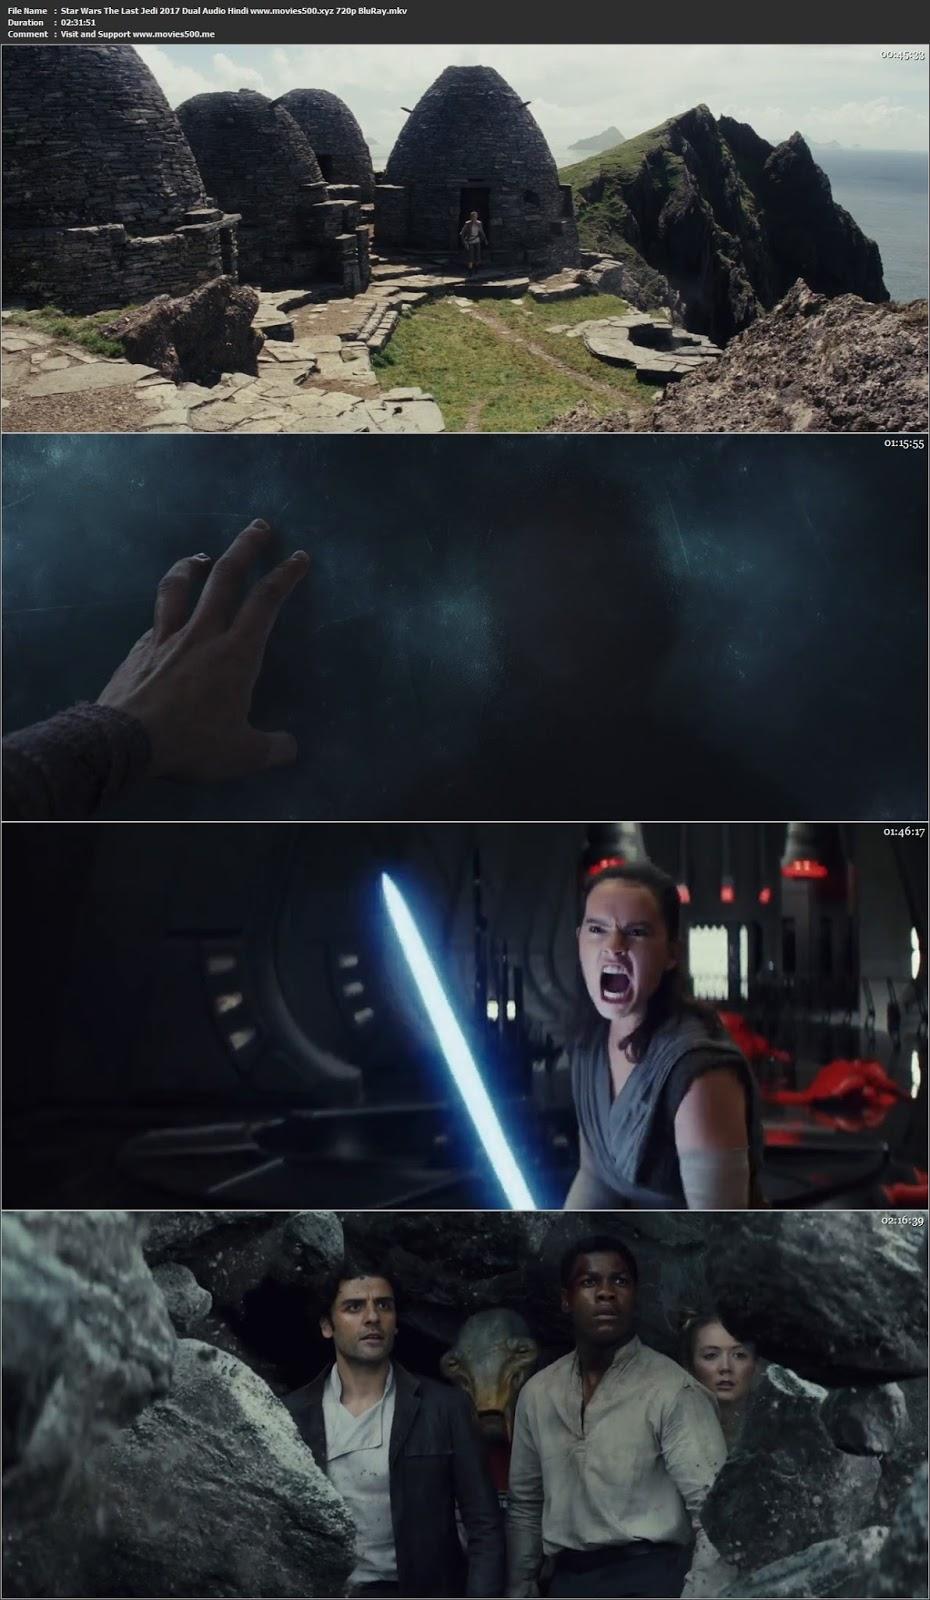 Star Wars The Last Jedi 2017 Dual Audio Hindi BluyRay 720p 1GB at movies500.site